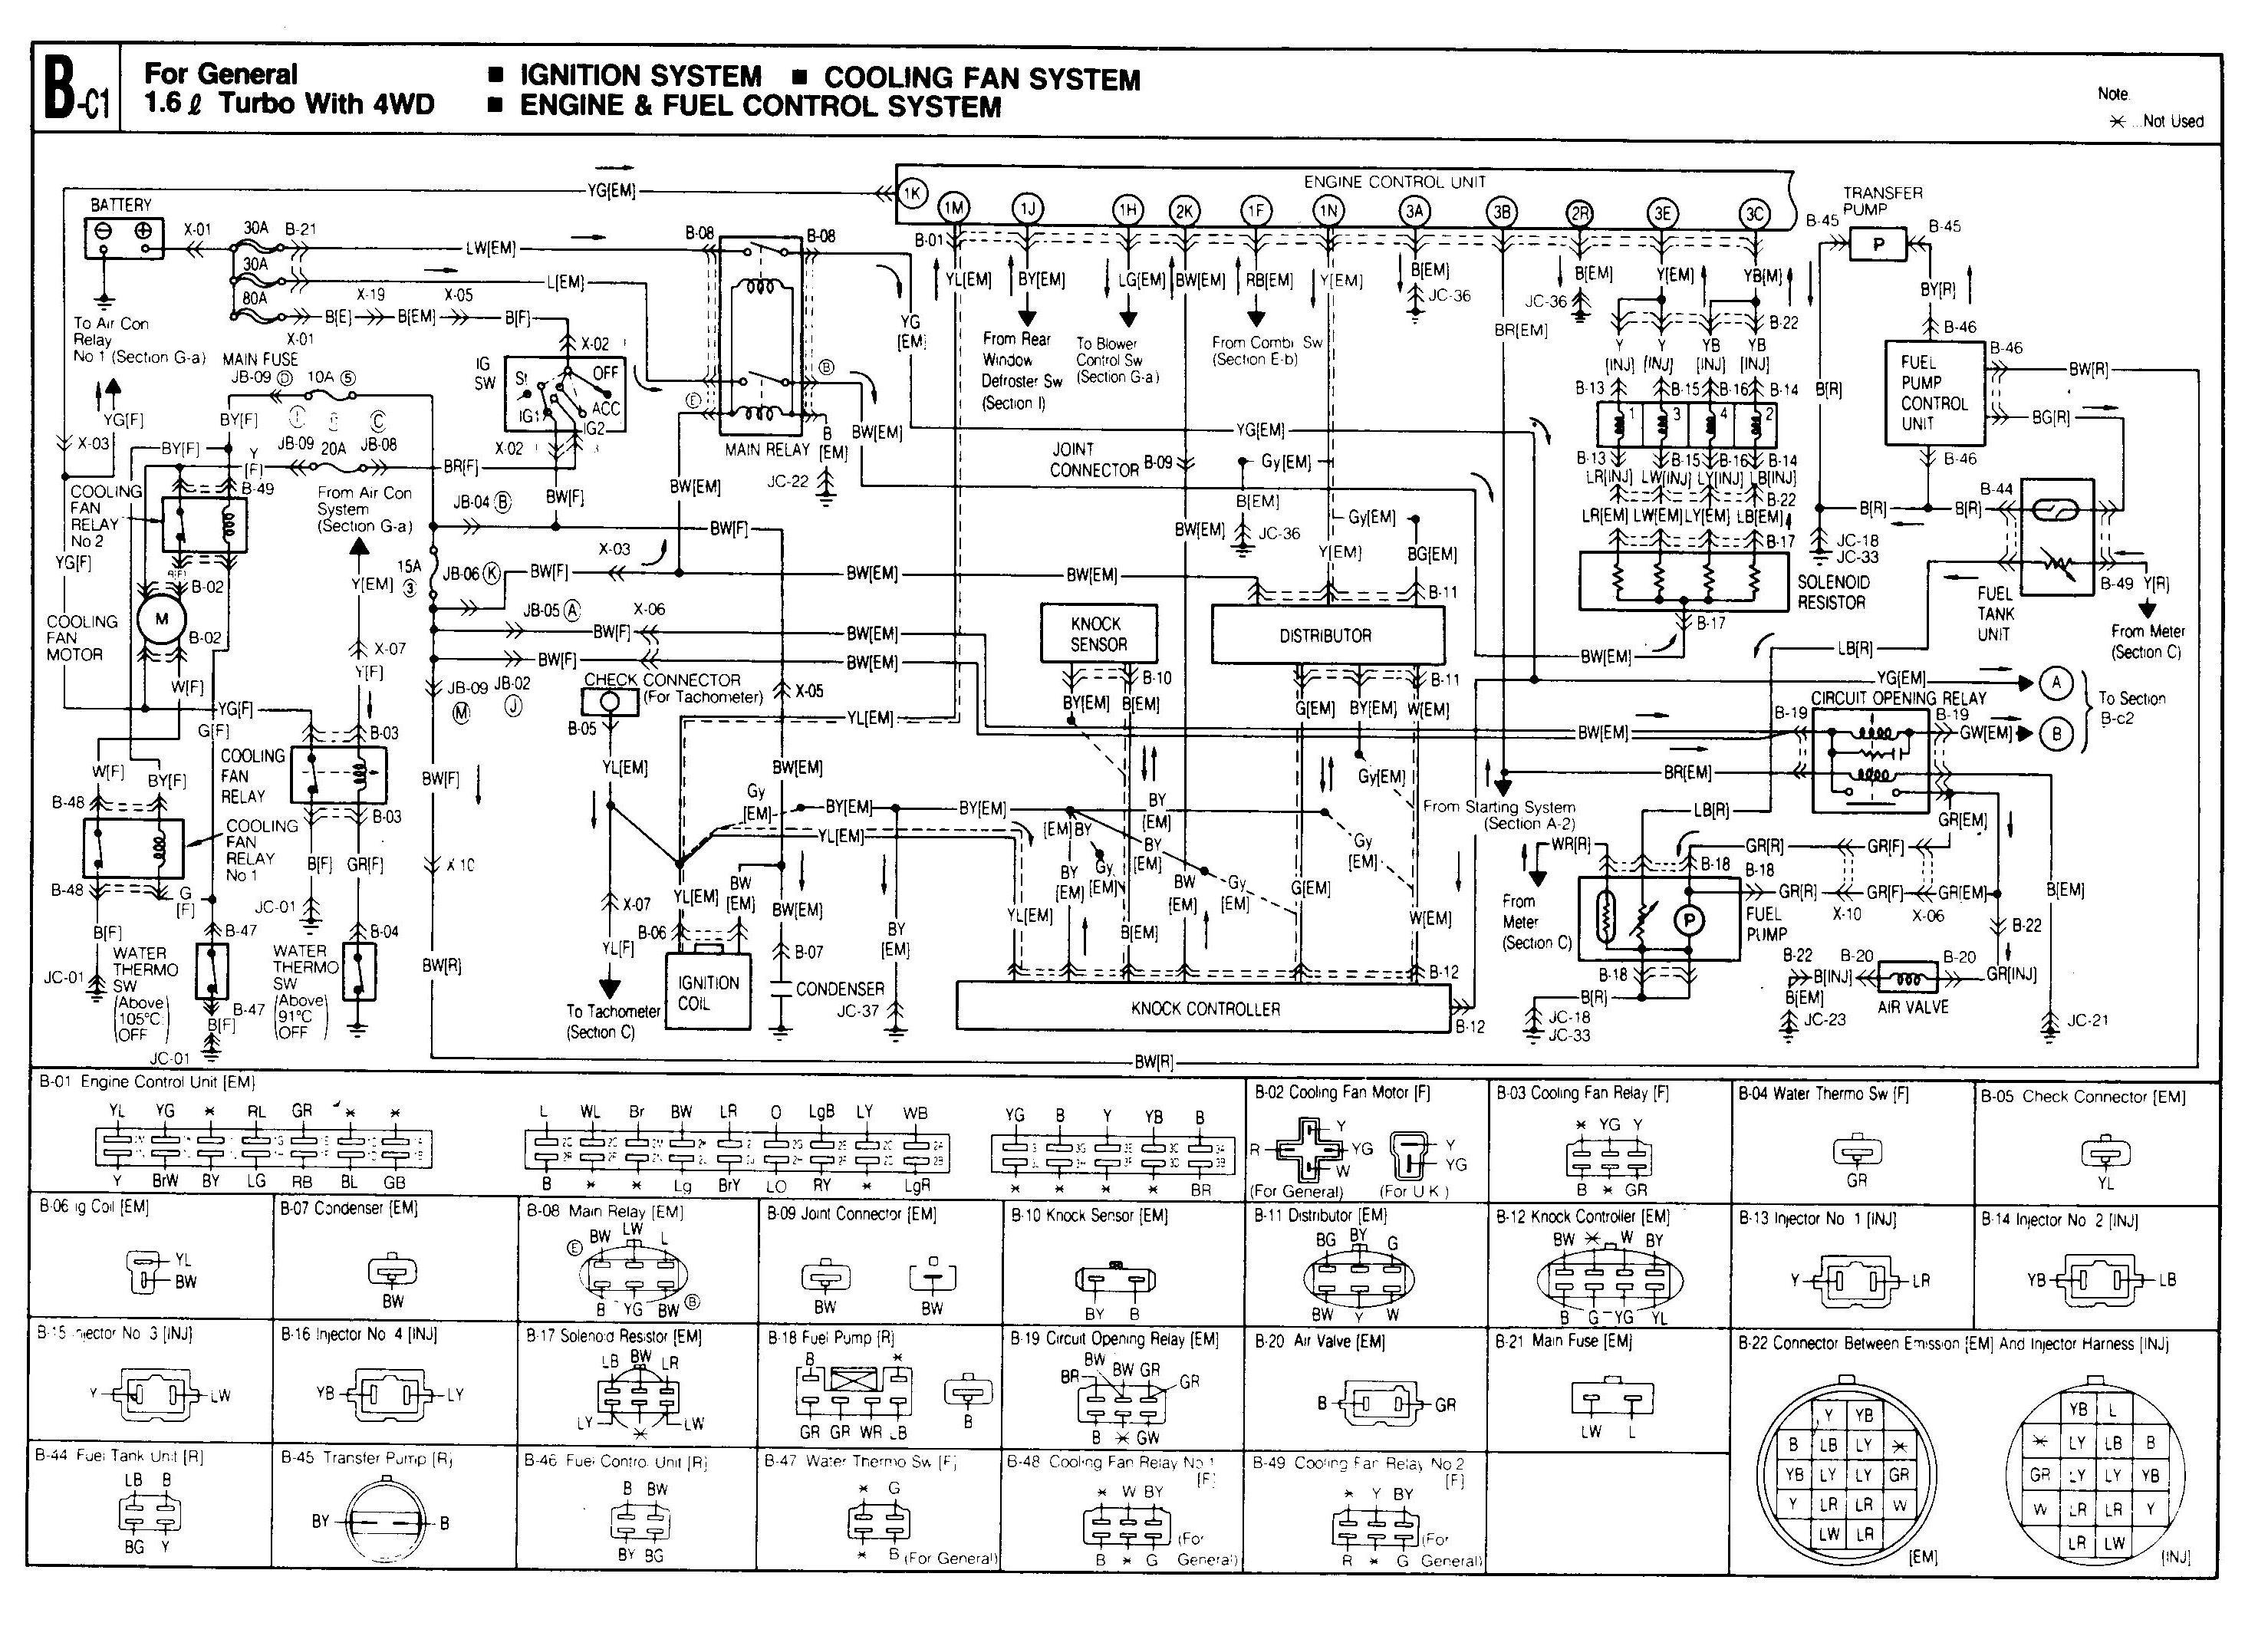 1992 mazda b2200 alternator wiring diagram vehicle diagrams engine library